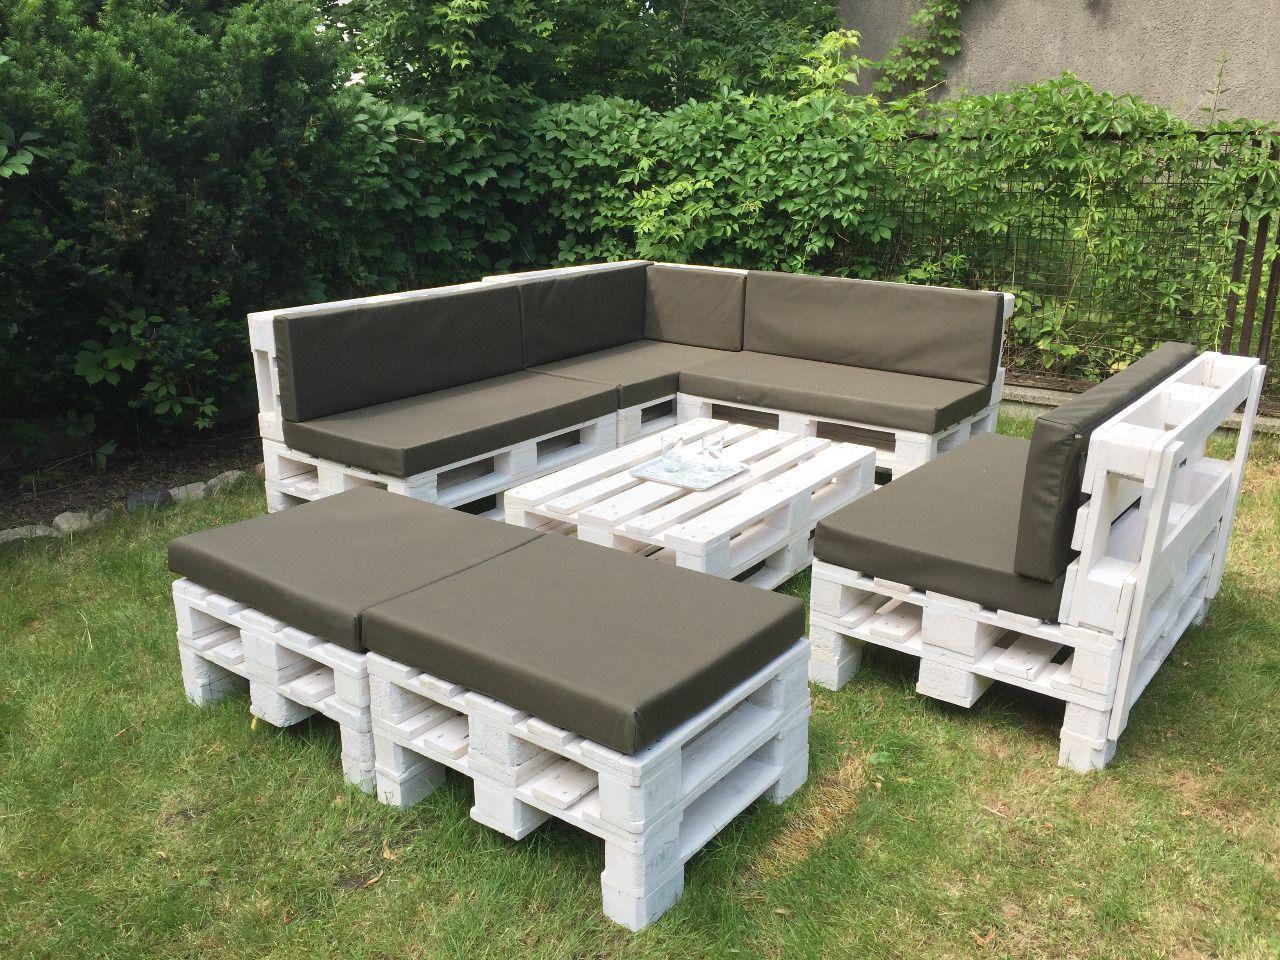 Naroznik Z Palet Meble Sofa Kanapa Zamownienie Pallet Furniture Outdoor Pallet Furniture Designs Outdoor Furniture Plans